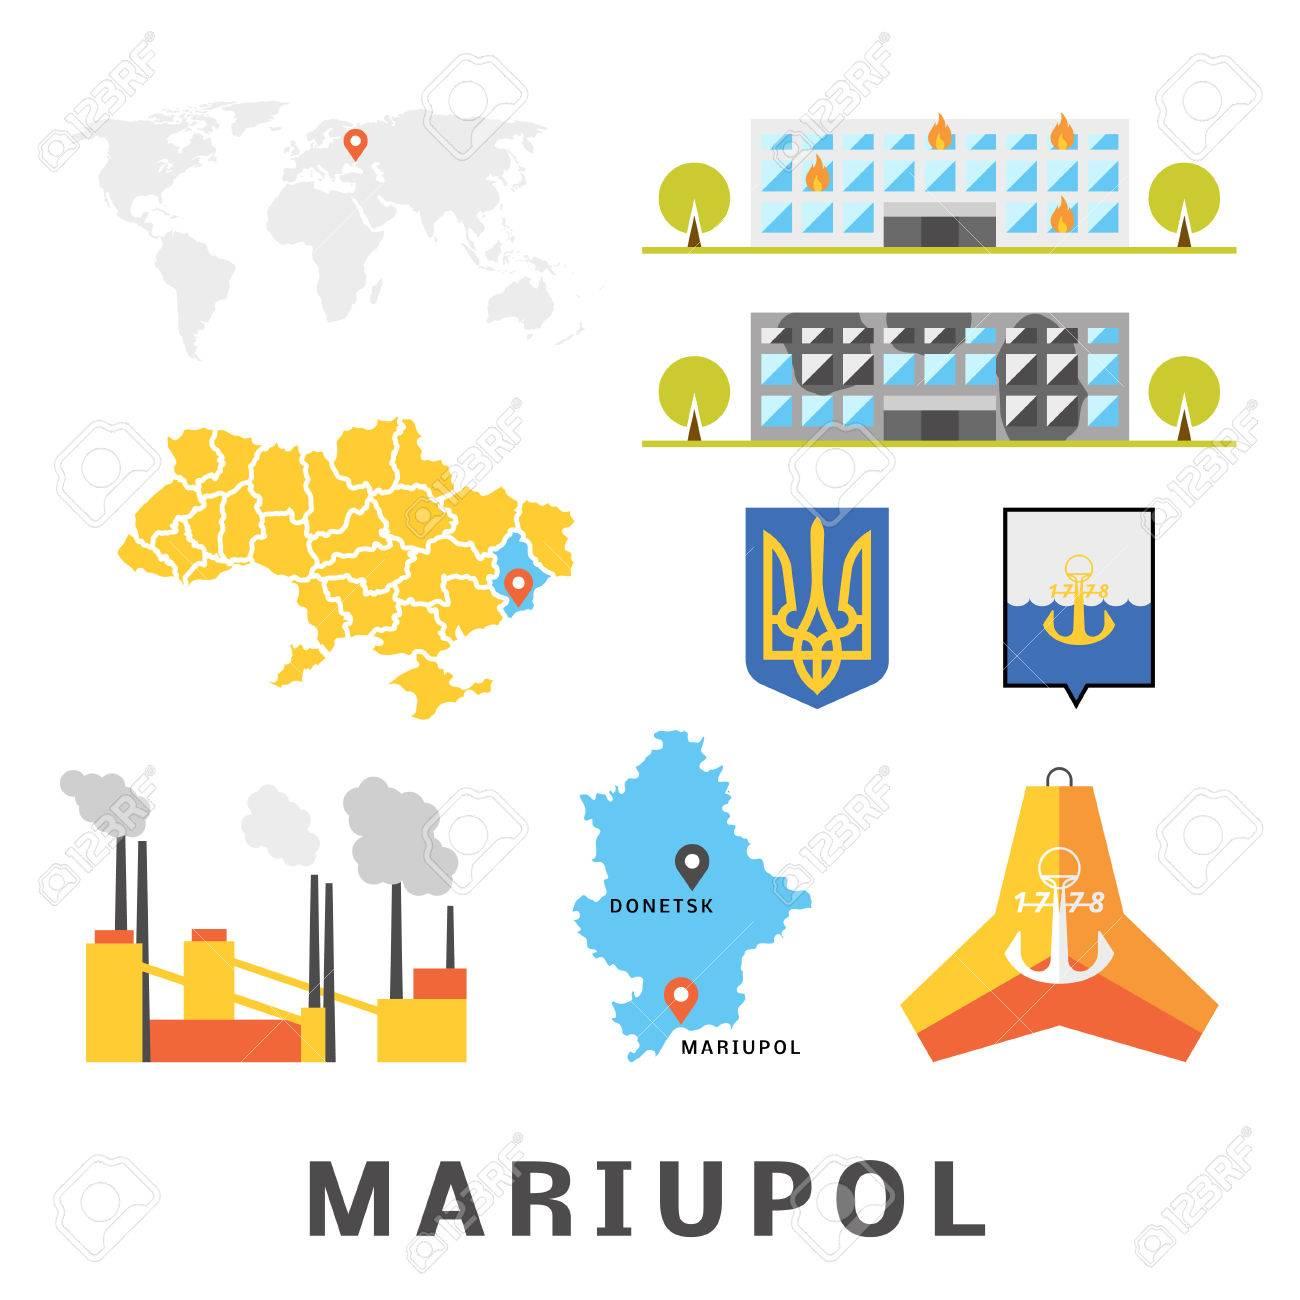 Mariupol Concept Set Of Objects Describing Mariupol Ukraine